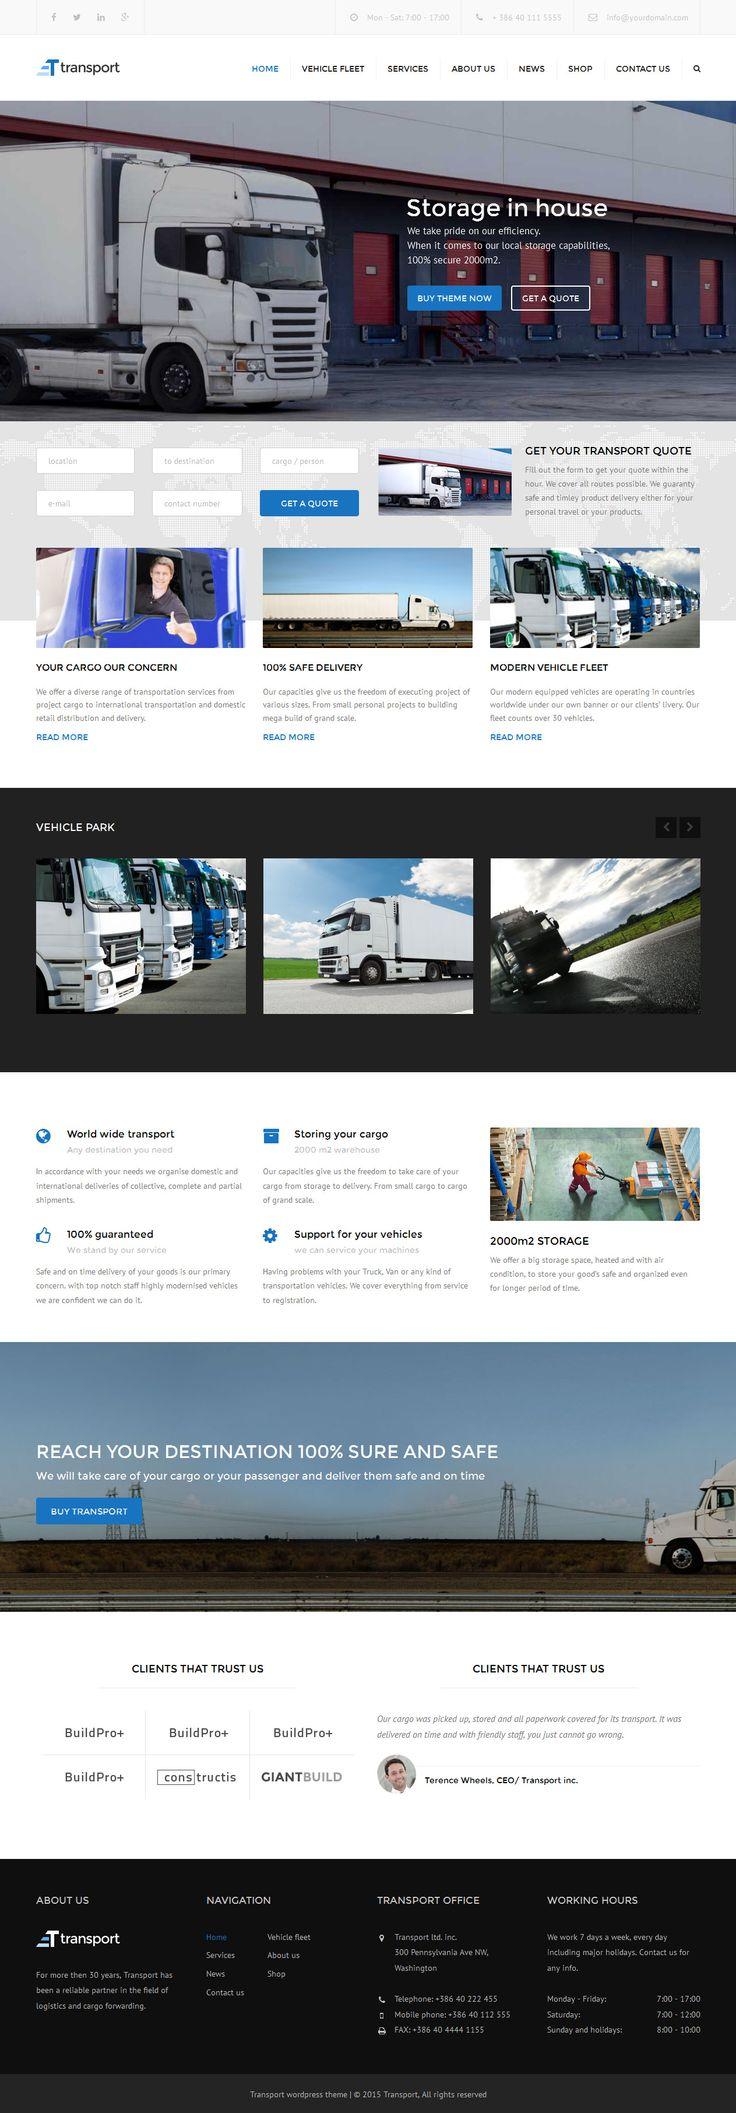 Transport theme is an Wordpress business theme. #webdesign Download: http://themeforest.net/item/transport-wp-transportation-logistic-theme-/11023307?ref=ksioks